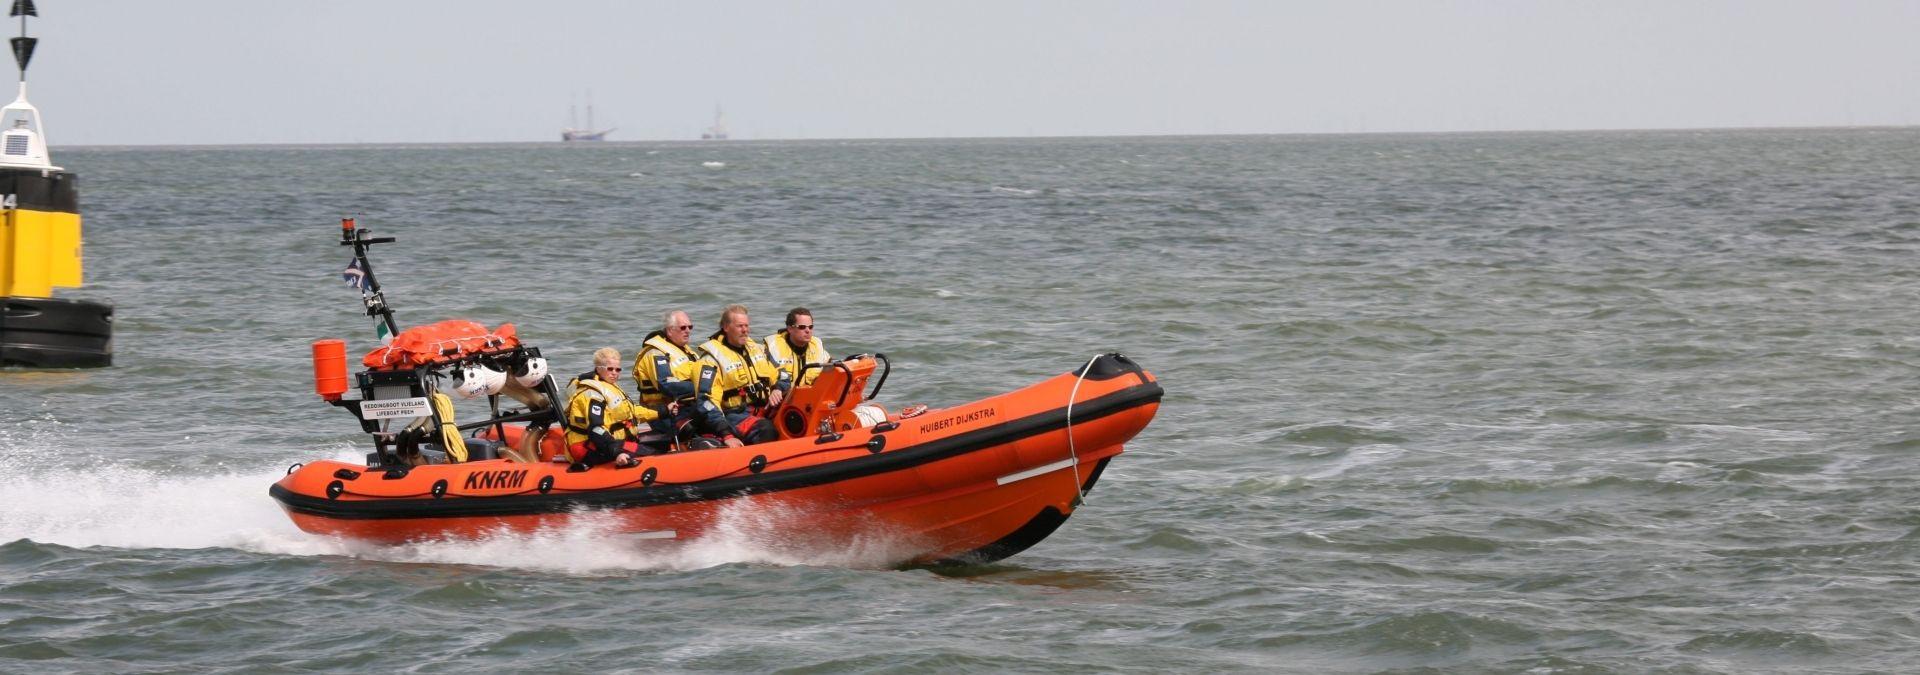 Reddingboot Huibert Dijkstra